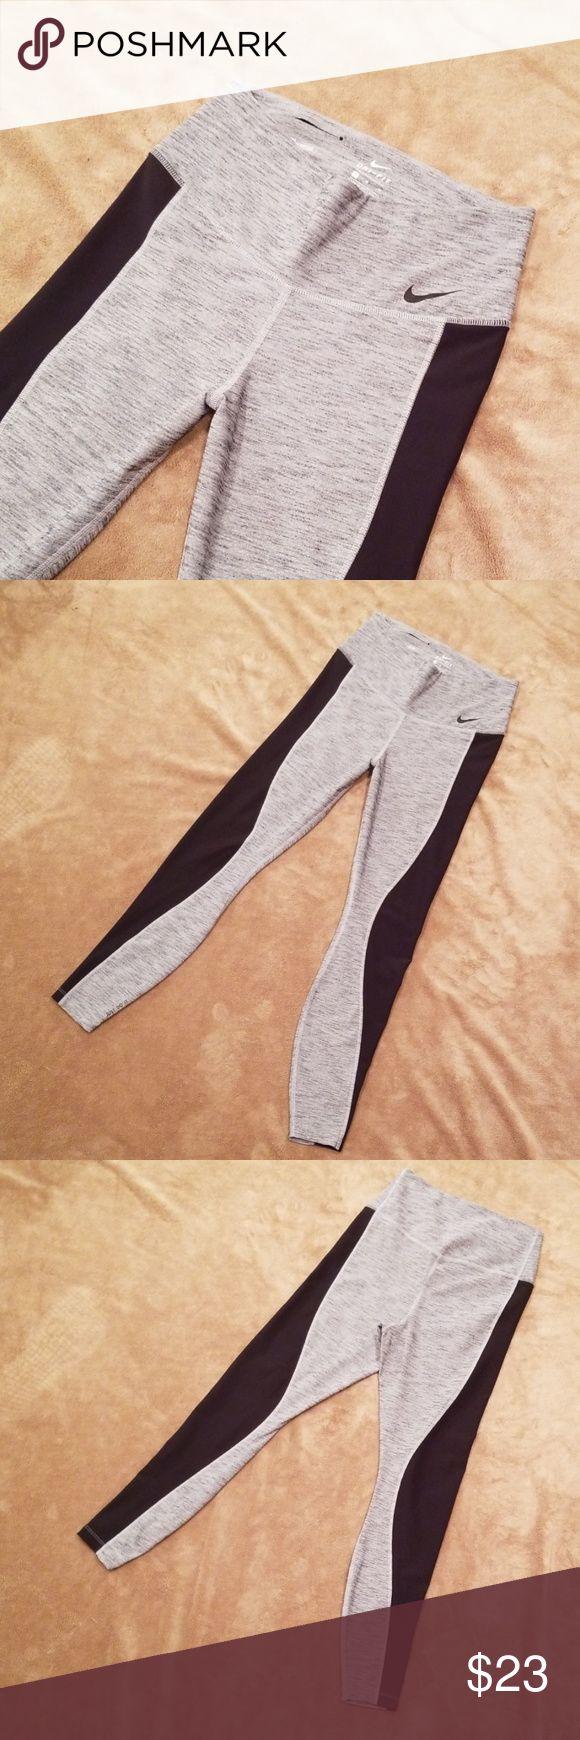 NIKE womens high waist leggings High waist, eco-friendly Nike leggings.  Interio…